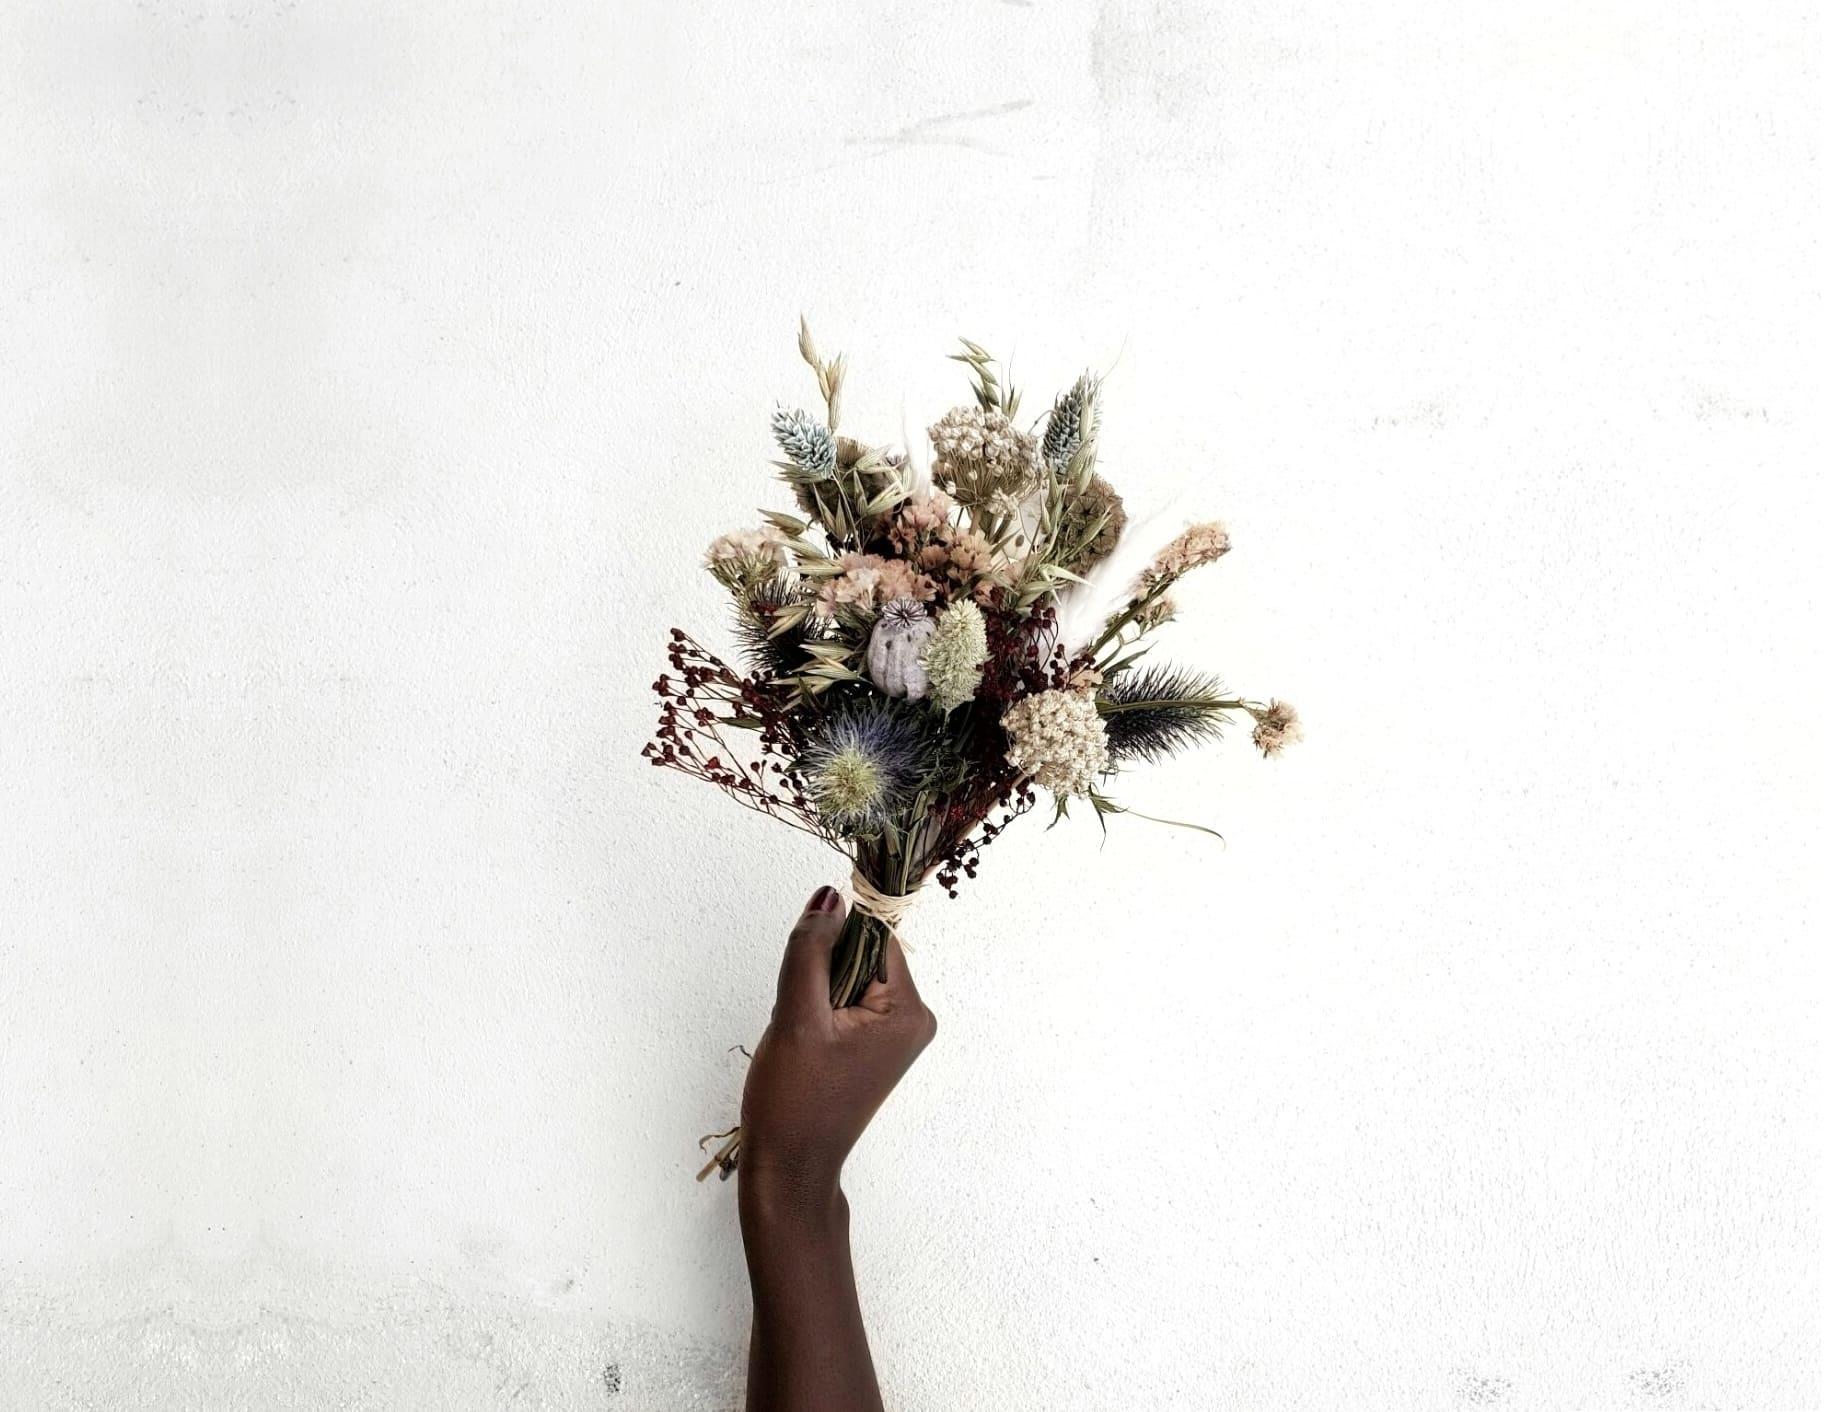 fleurs-responables-cadeau-noel-ecolo